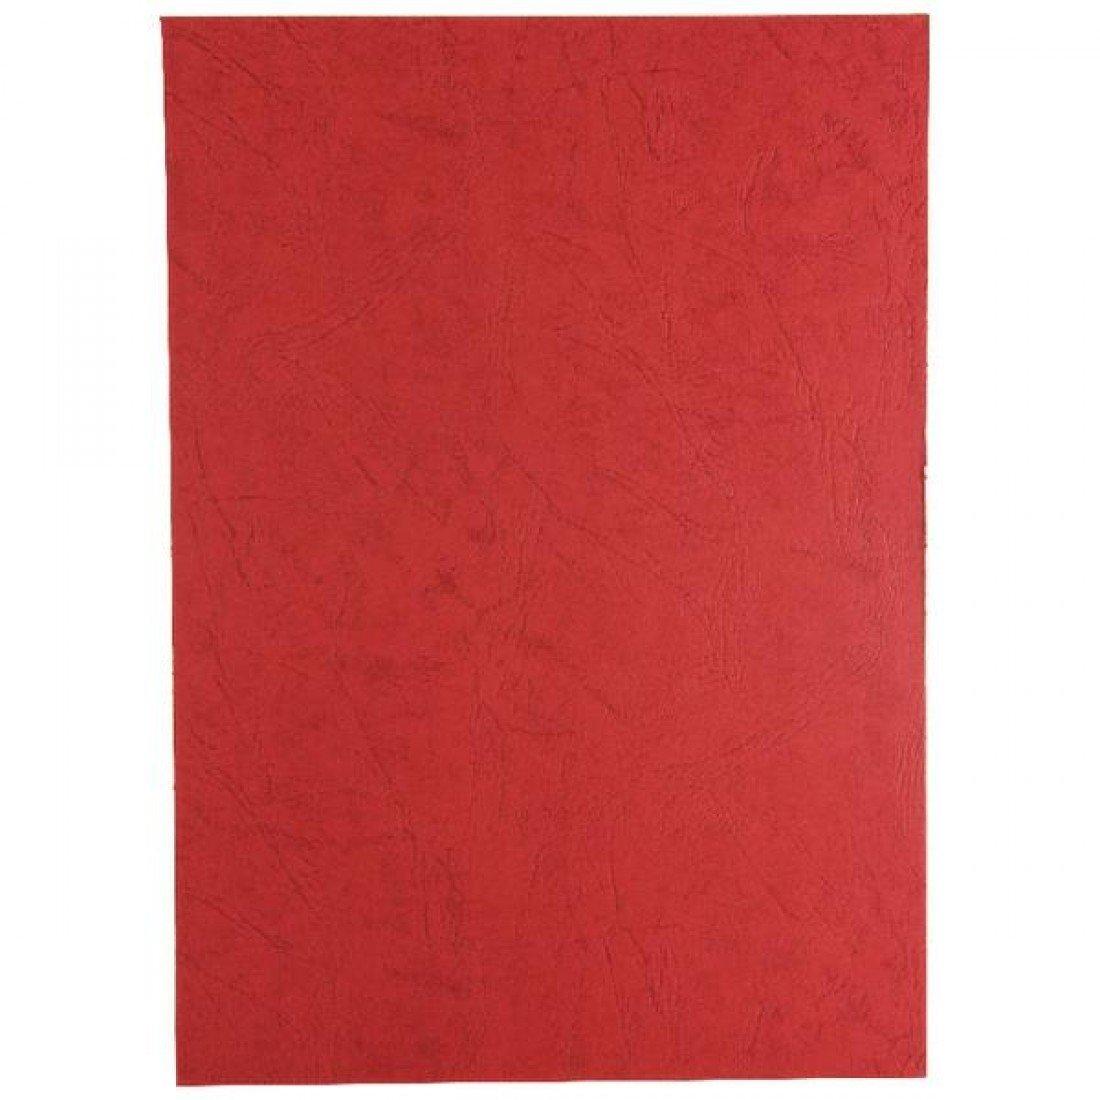 GBC Leathergrain Cover Set Dark Red A4 50 Pairs CE040030